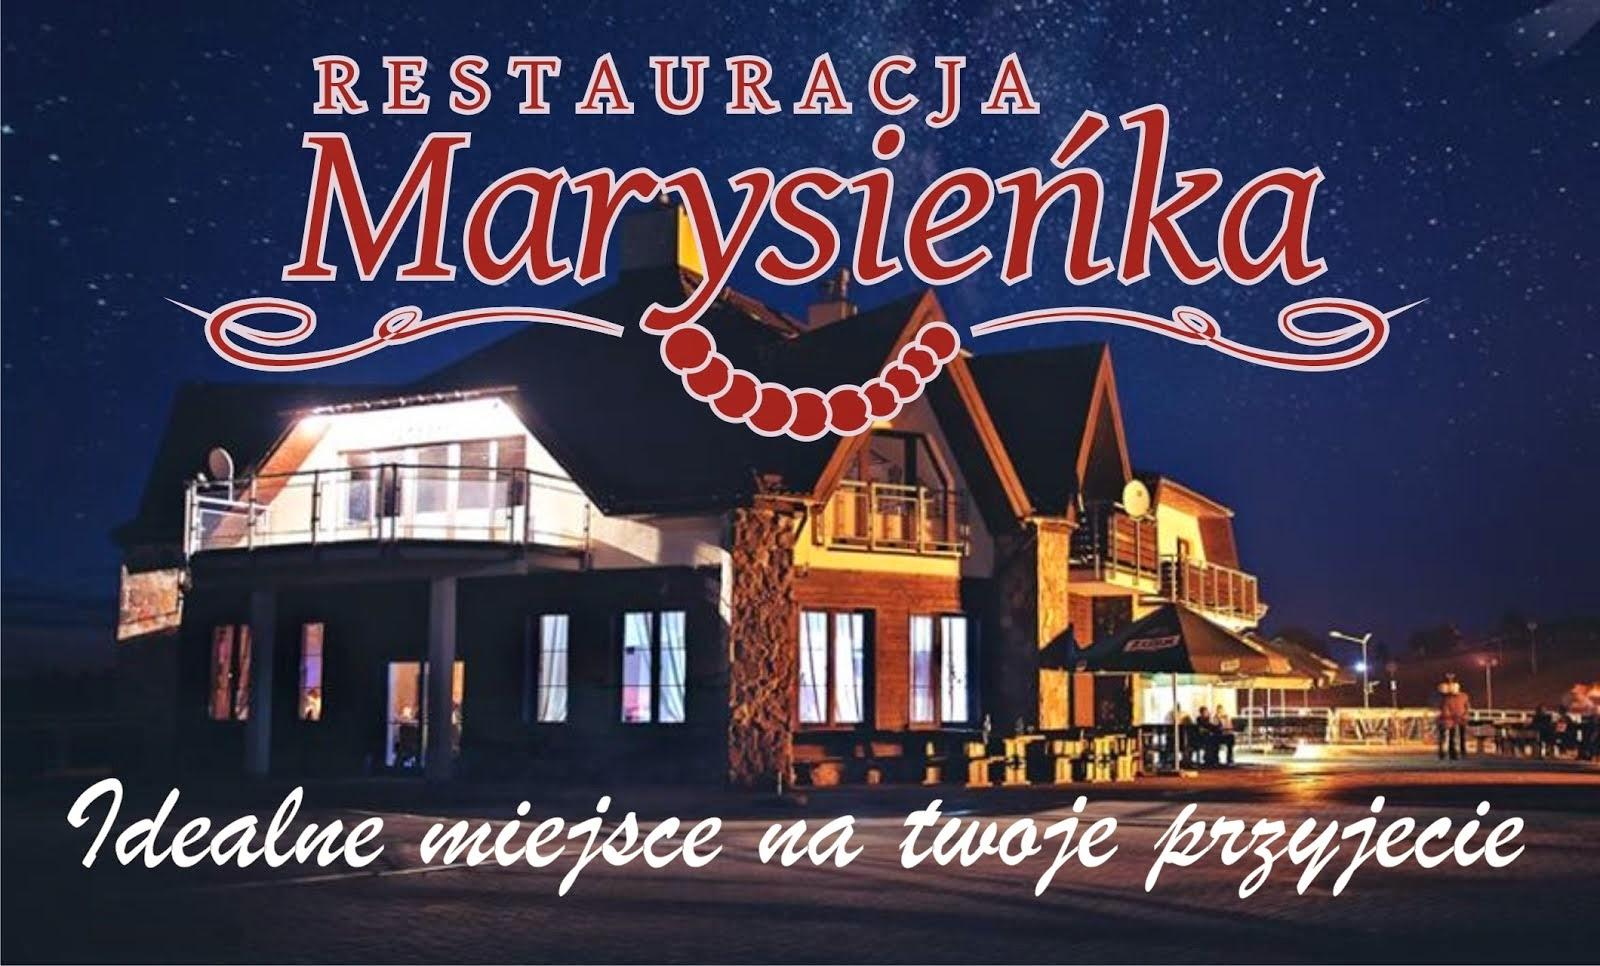 Marysieńka